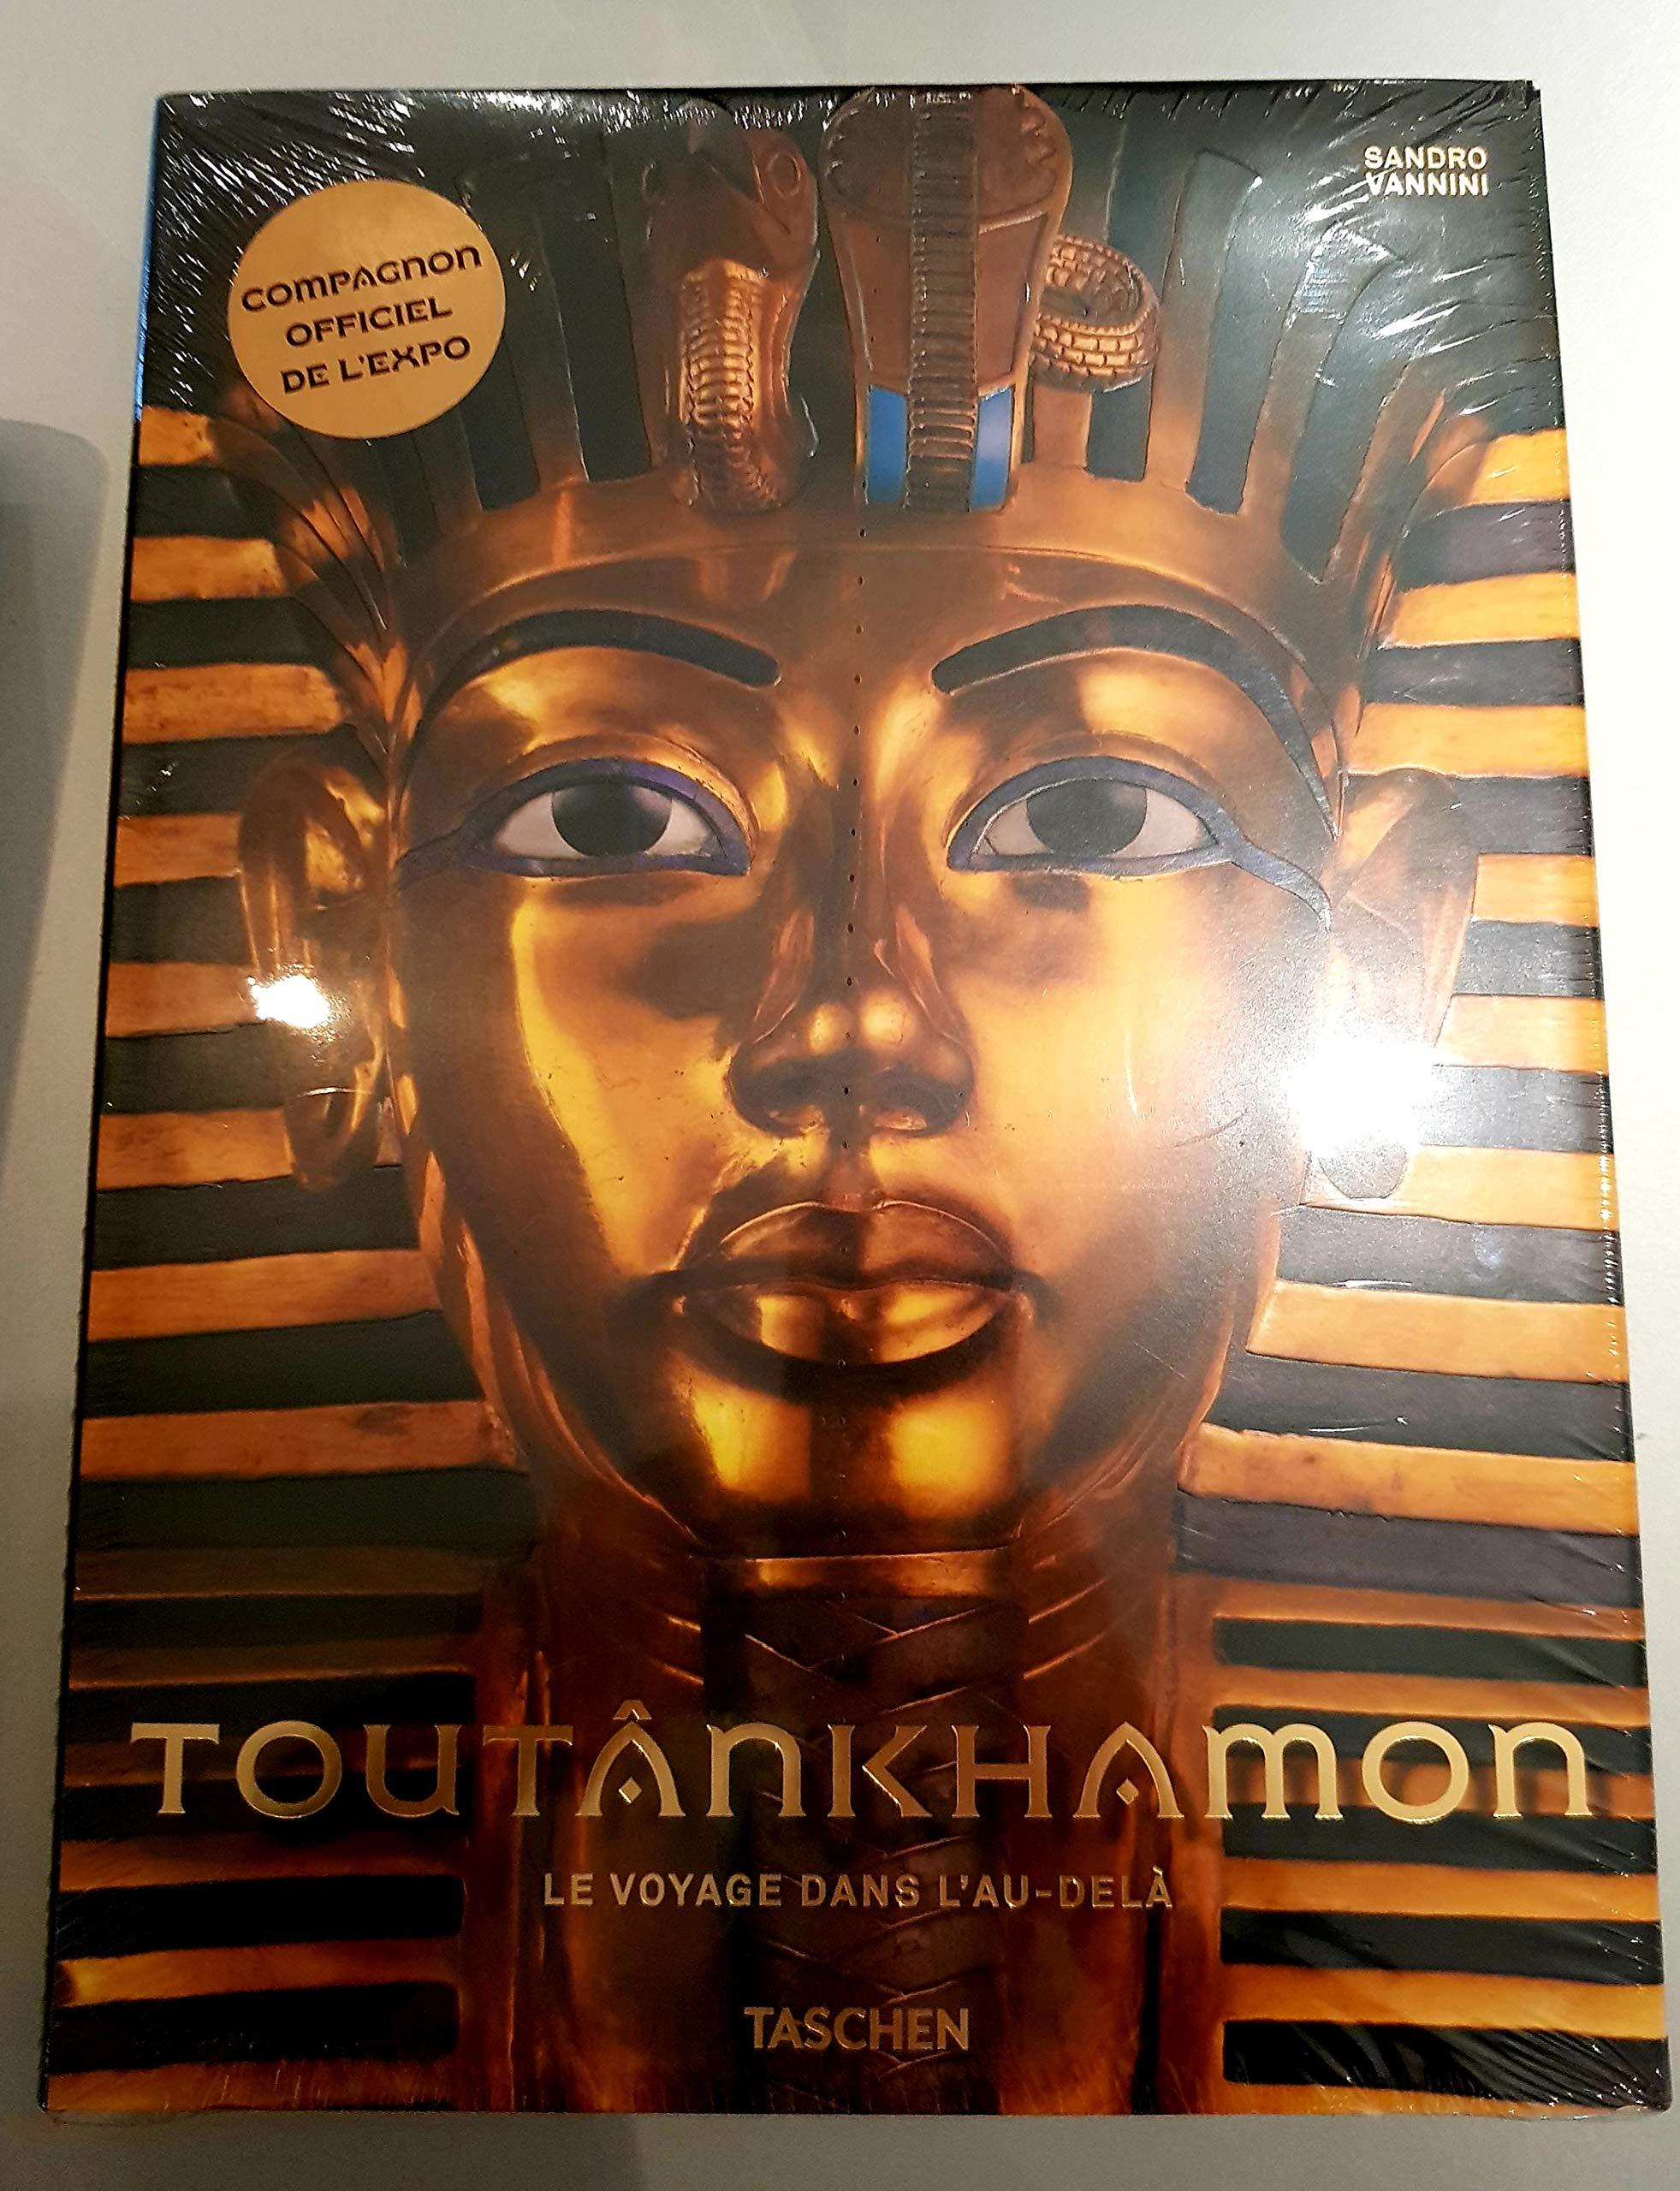 Toutankhamon : Le voyage dans le monde d'En-bas por Sandro Vannini